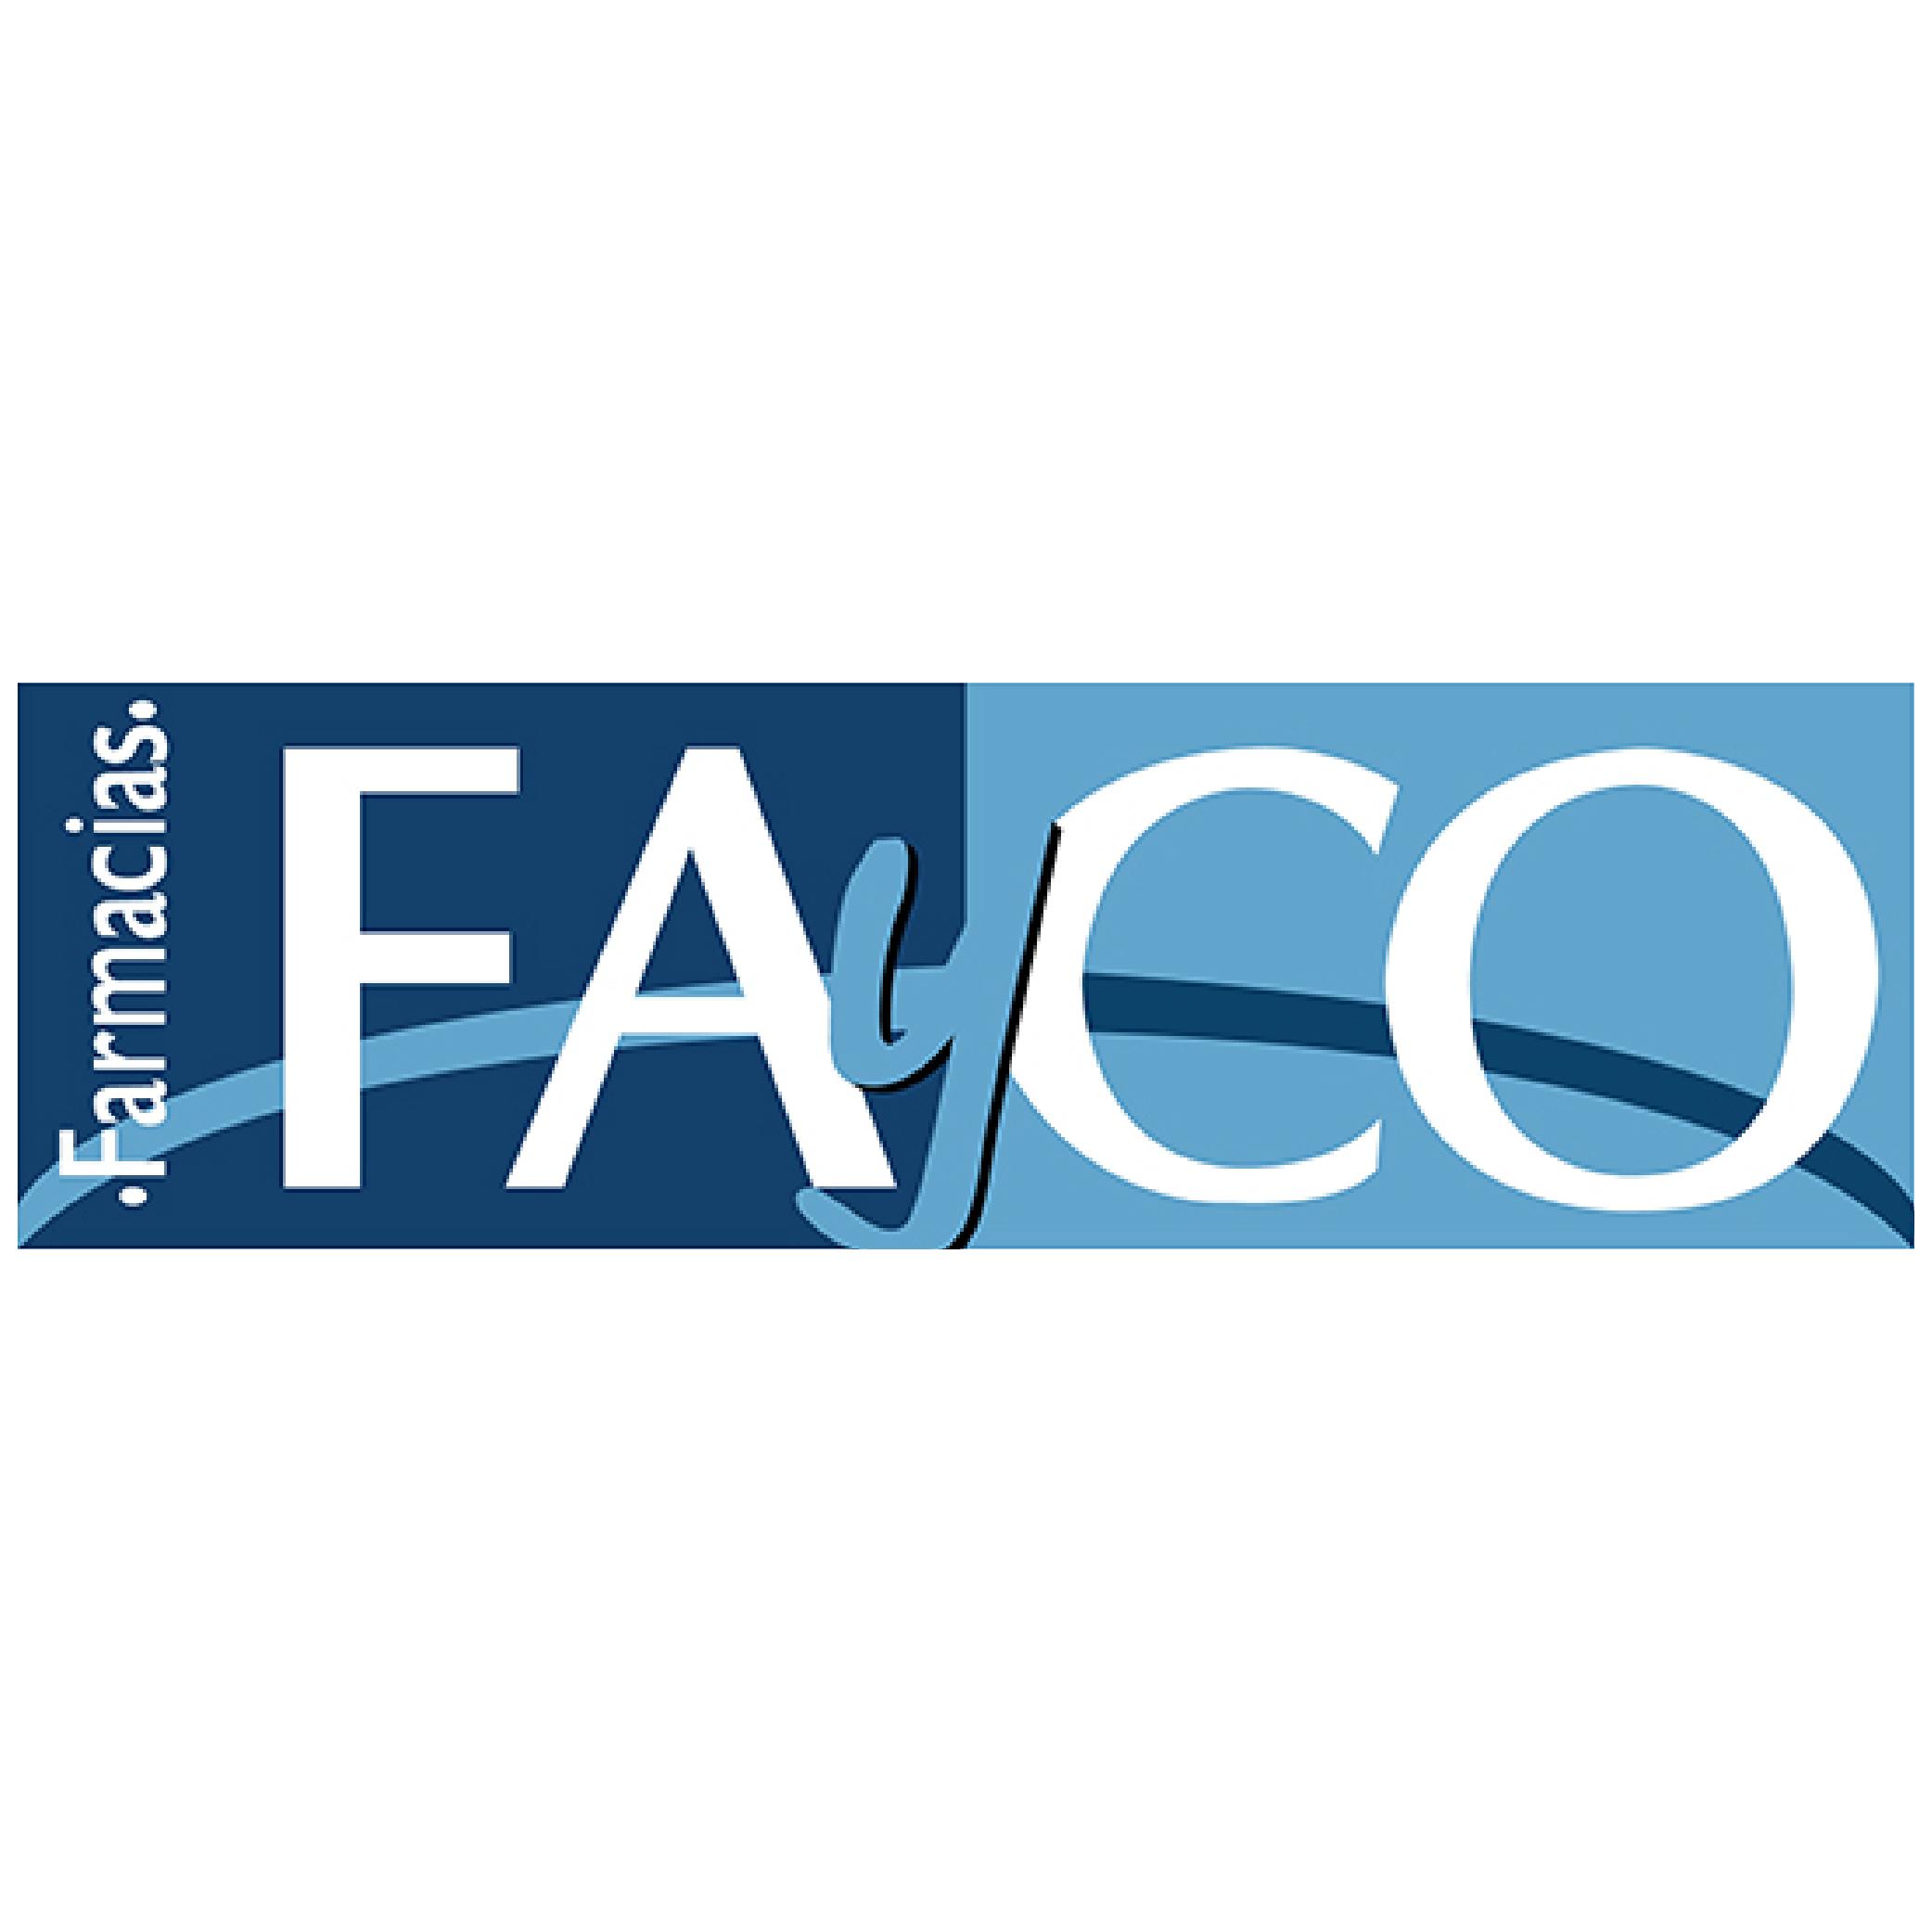 FAYCO